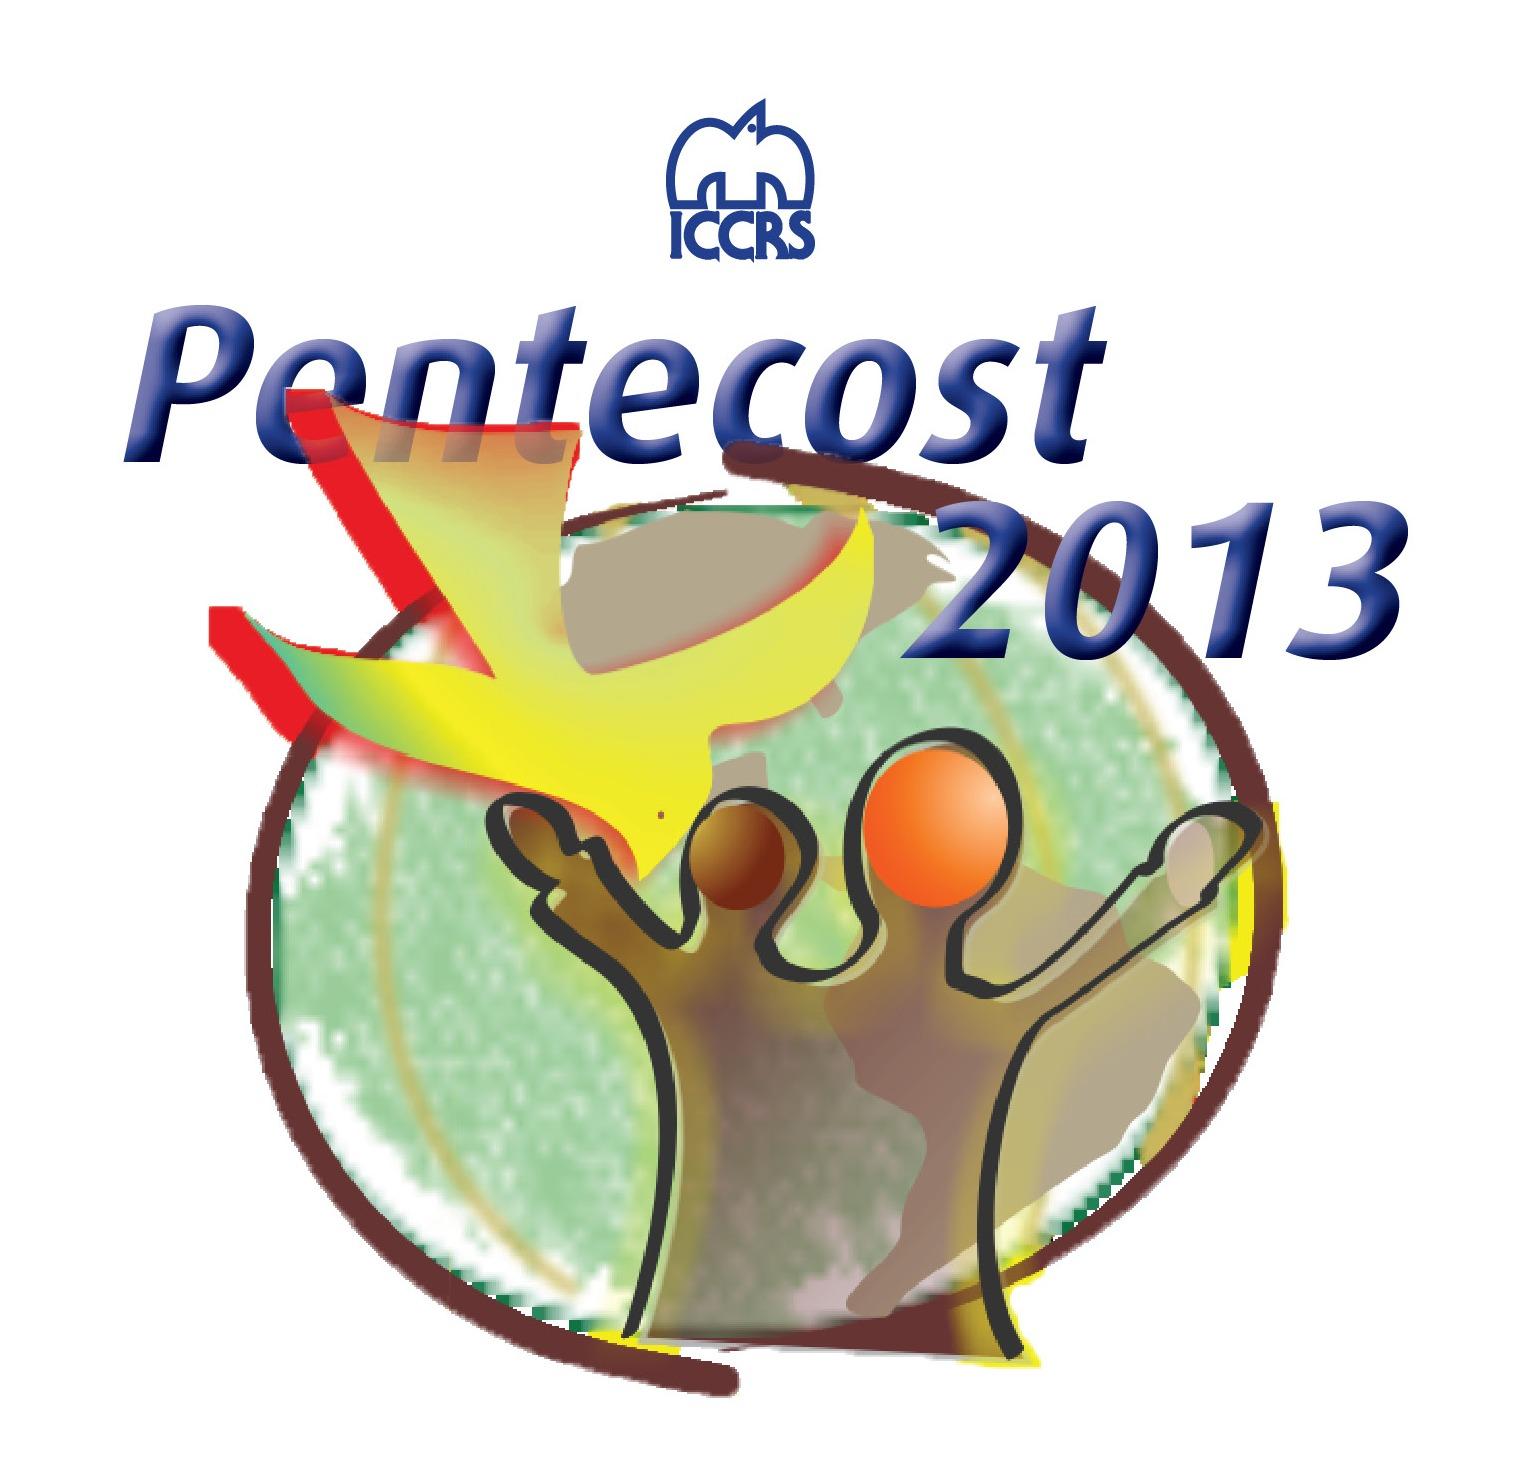 1526x1482 Pentecost 2013 Pentecost